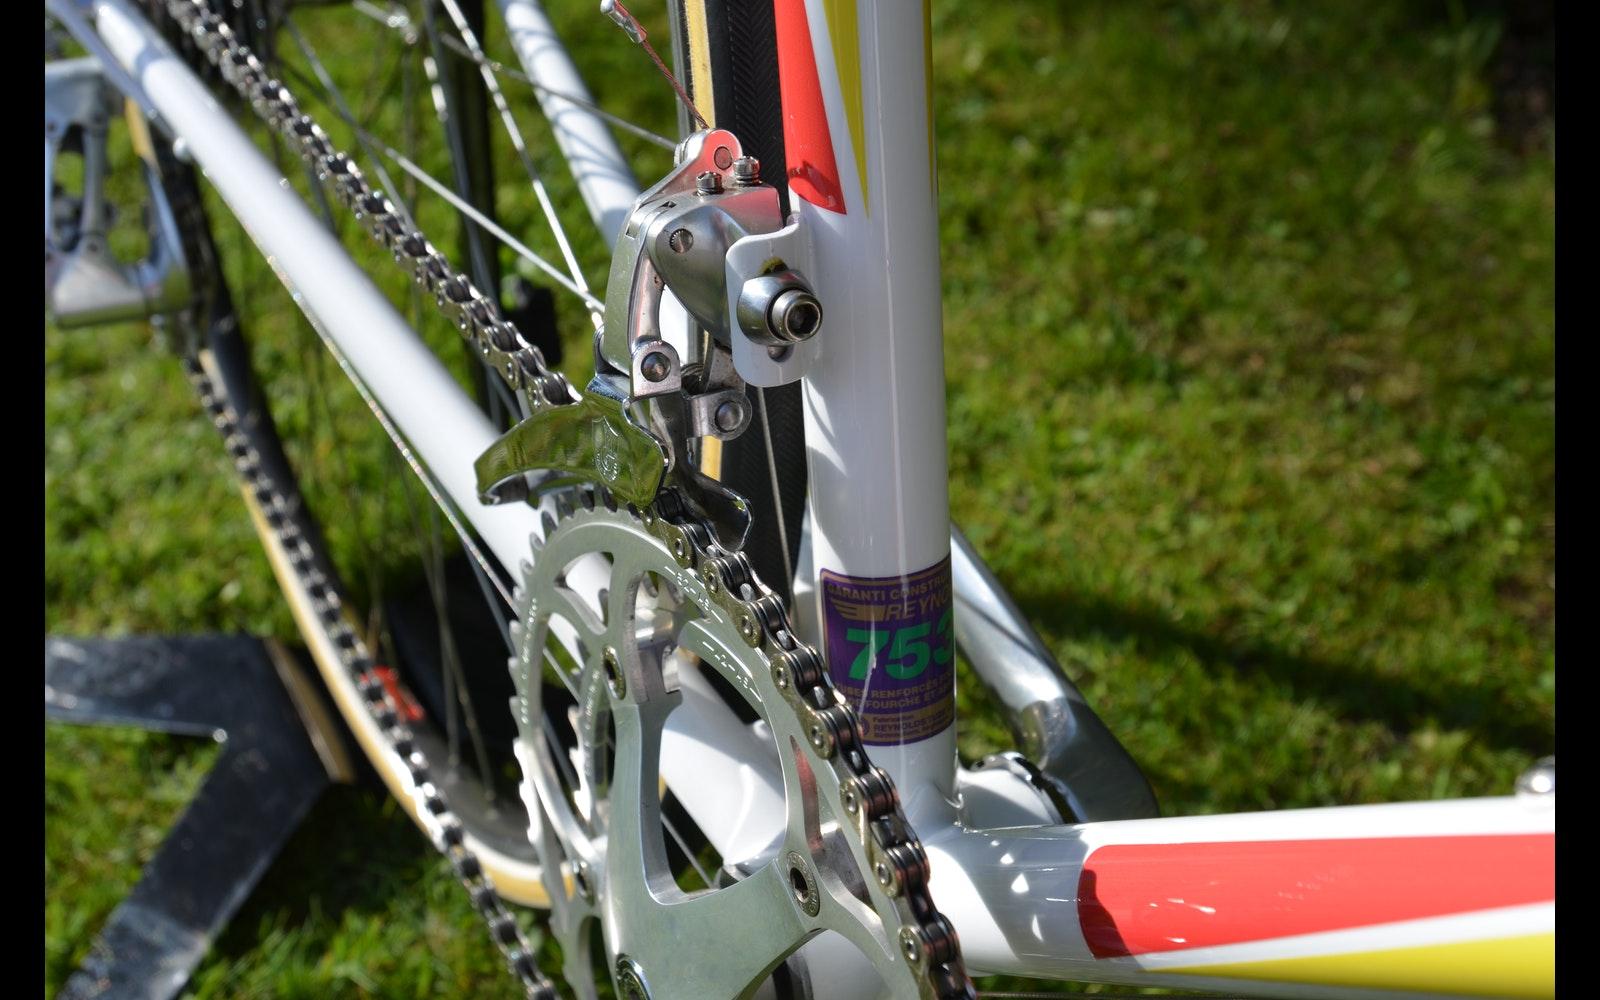 Vintage Bikes For Sale Raleigh Sbdu Team Castorama